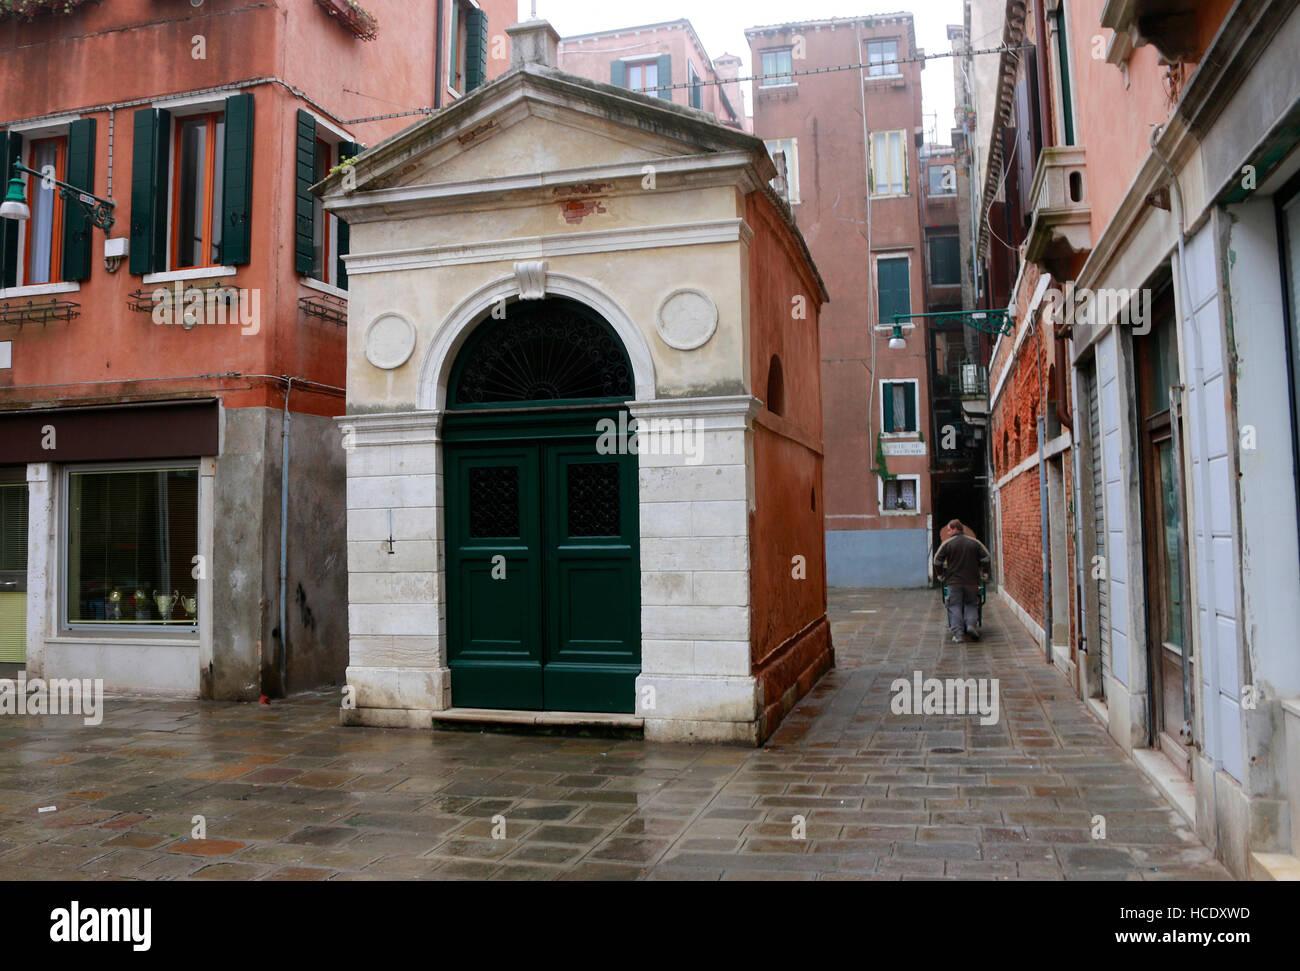 Impressionen - Venedig, Italien. - Stock Image